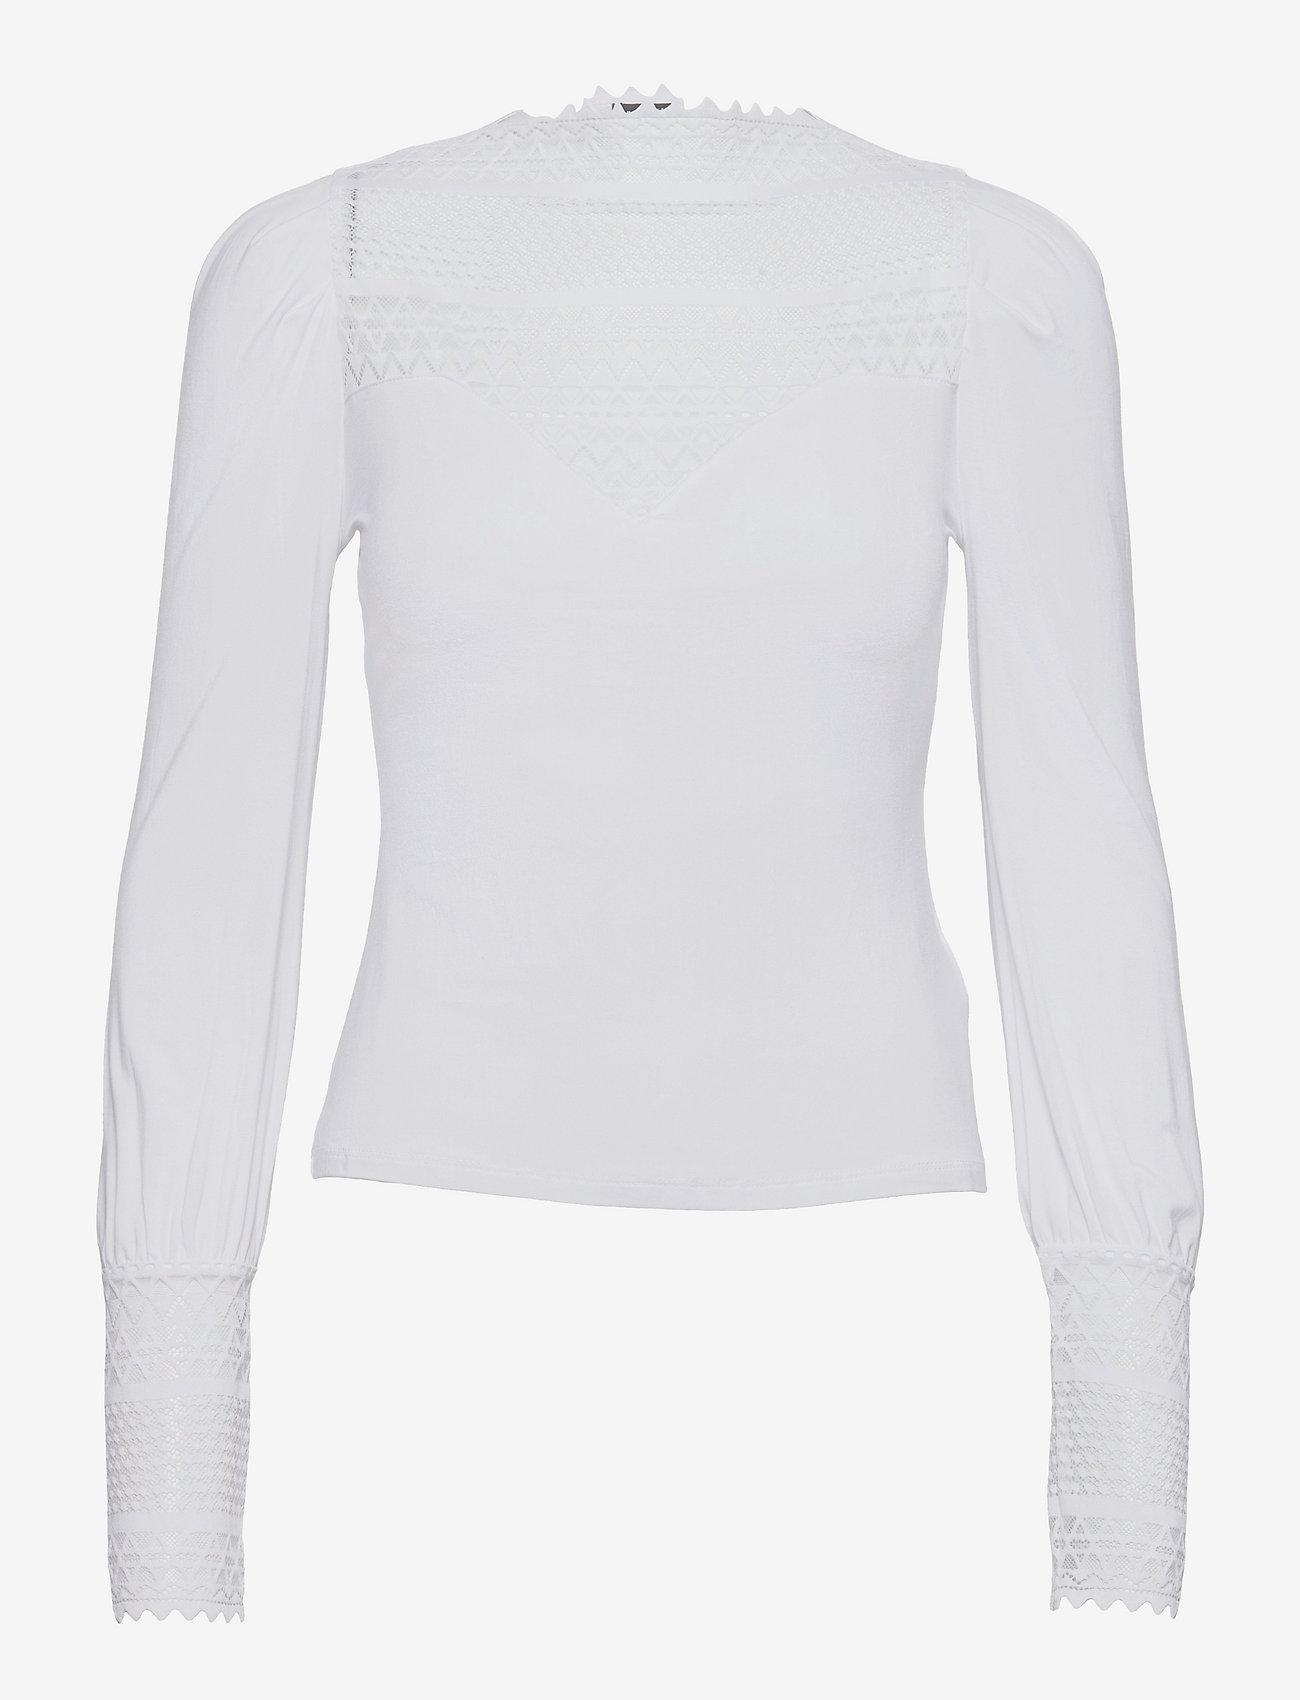 GUESS Jeans - LS LATIFE TOP - långärmade blusar - pure white - 0